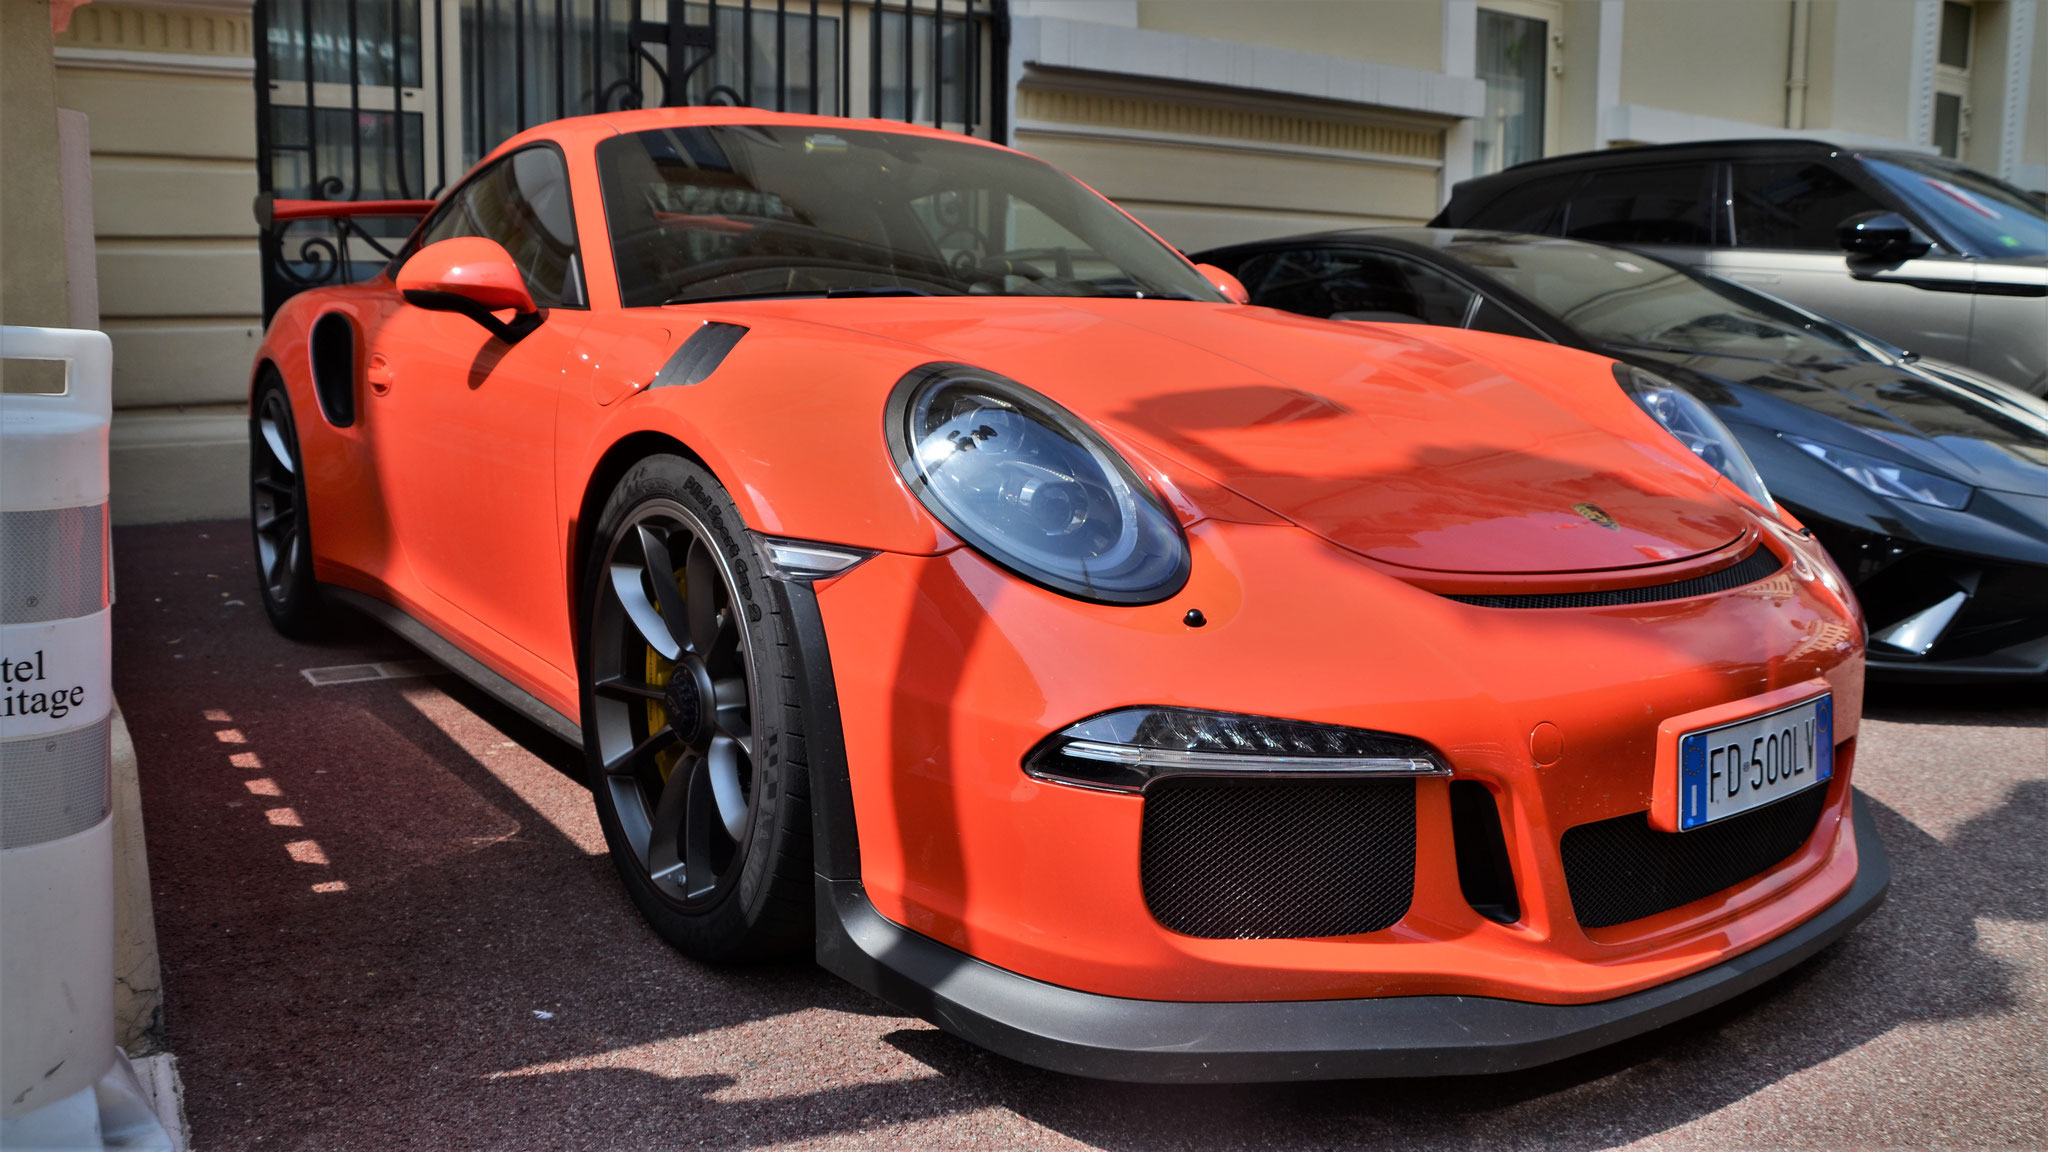 Porsche 911 GT3 RS - FD-500-LV (ITA)